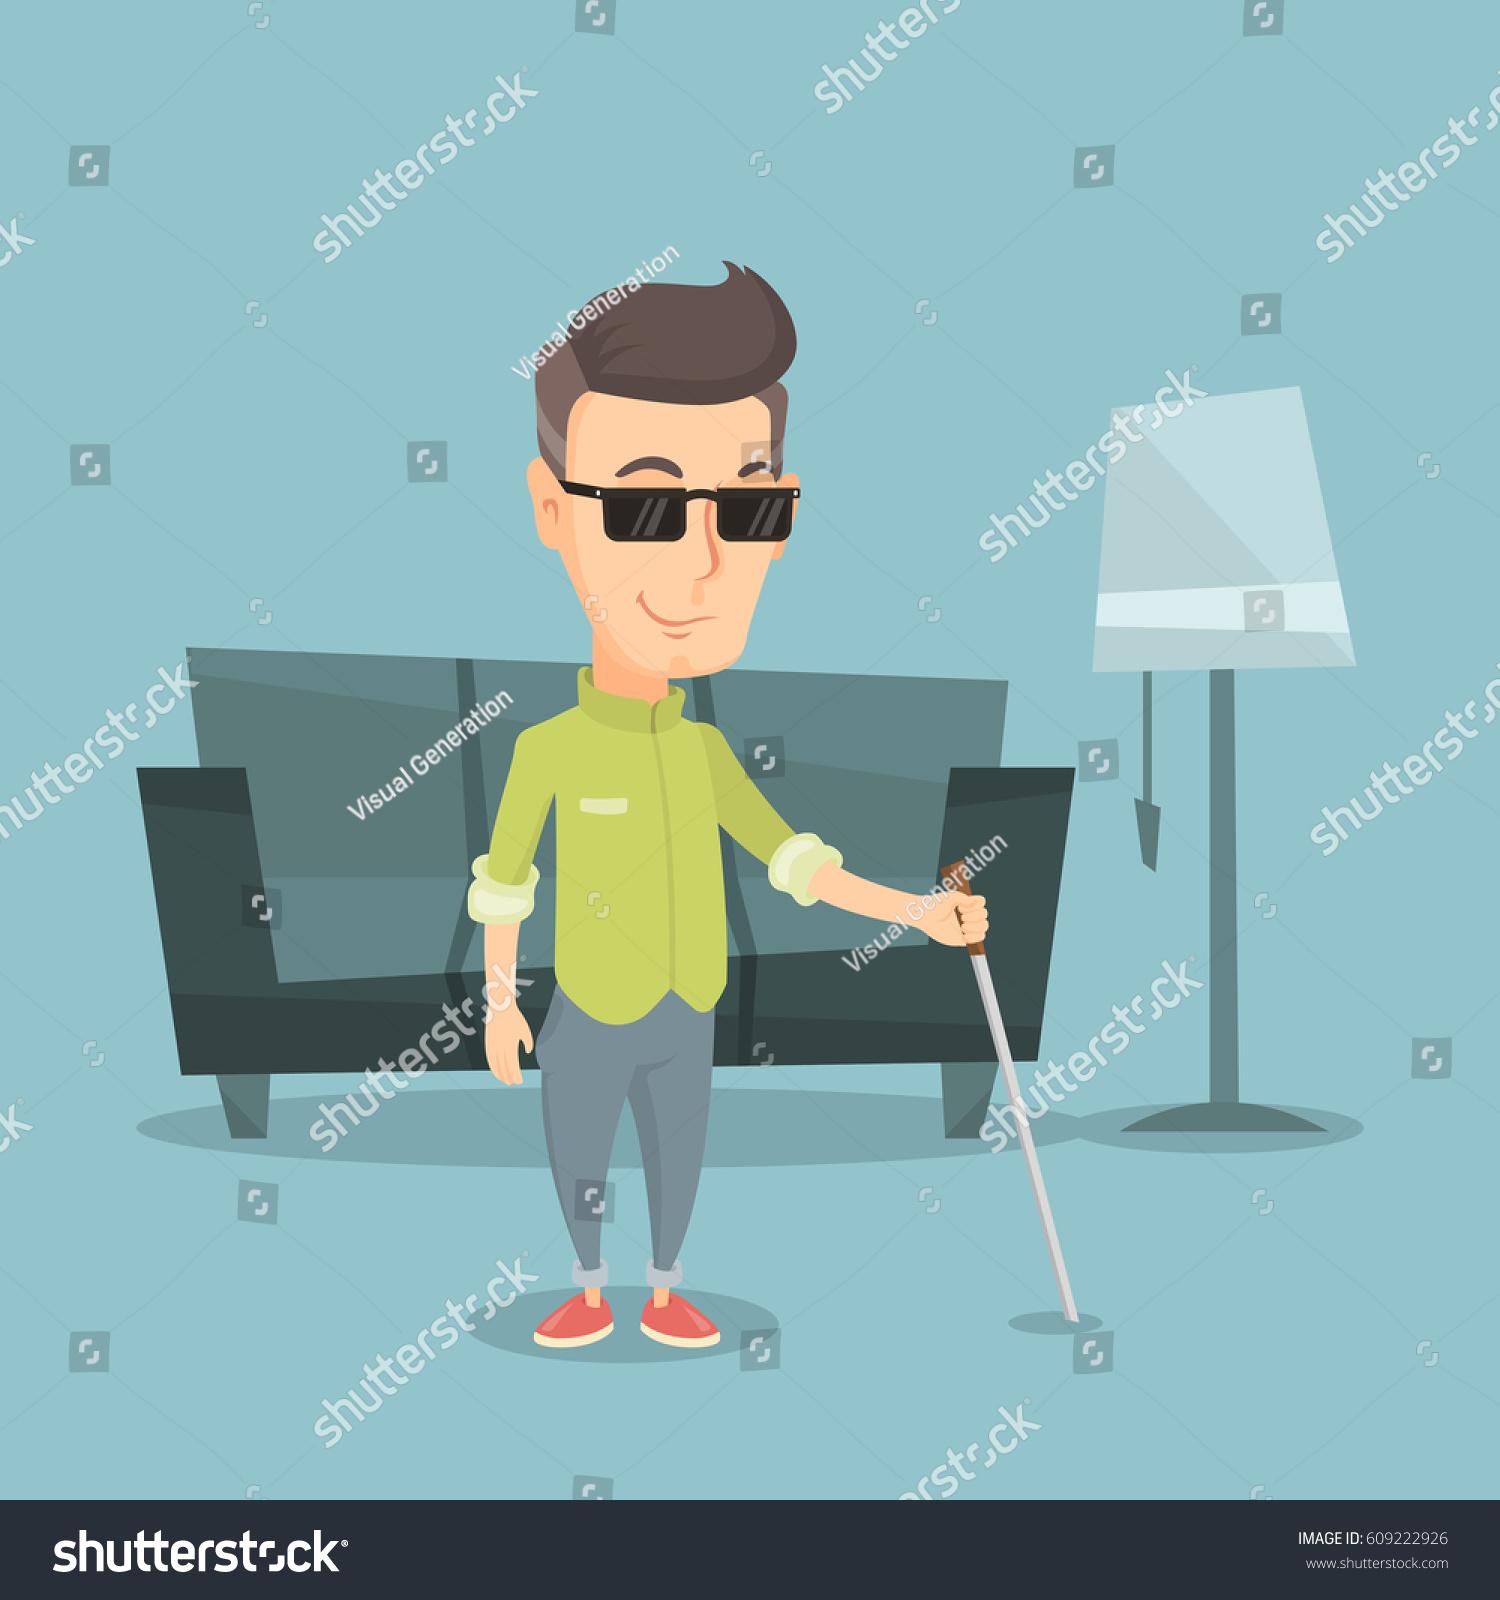 caucasian blind man standing walking stick stock vector royalty